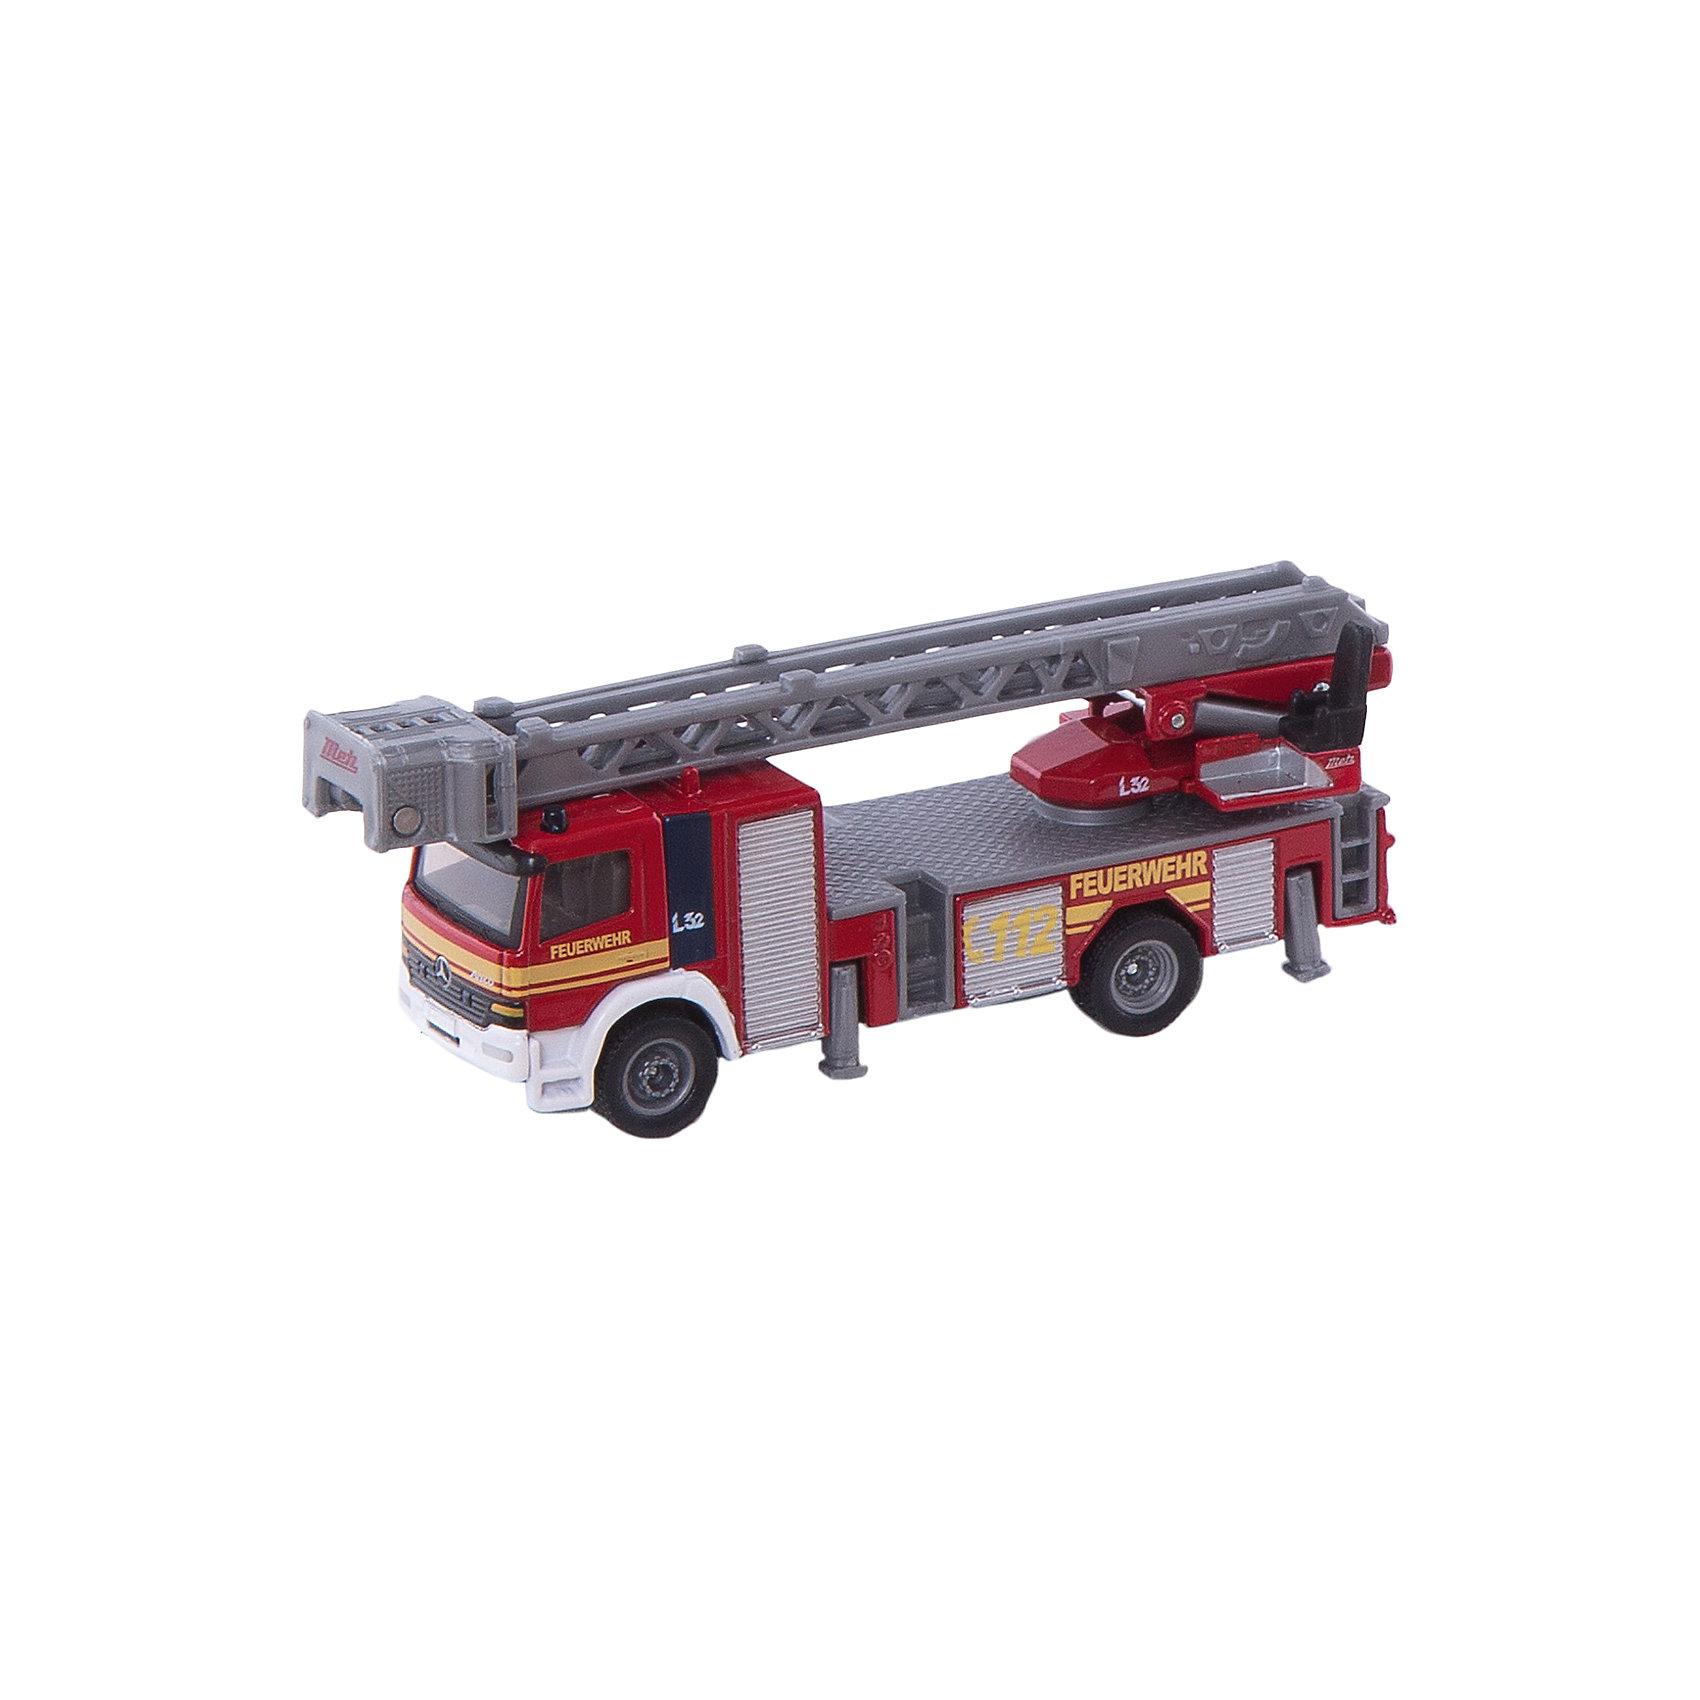 SIKU SIKU 1841 Пожарная машина с лестницей 1:87 машинки siku городской автобус